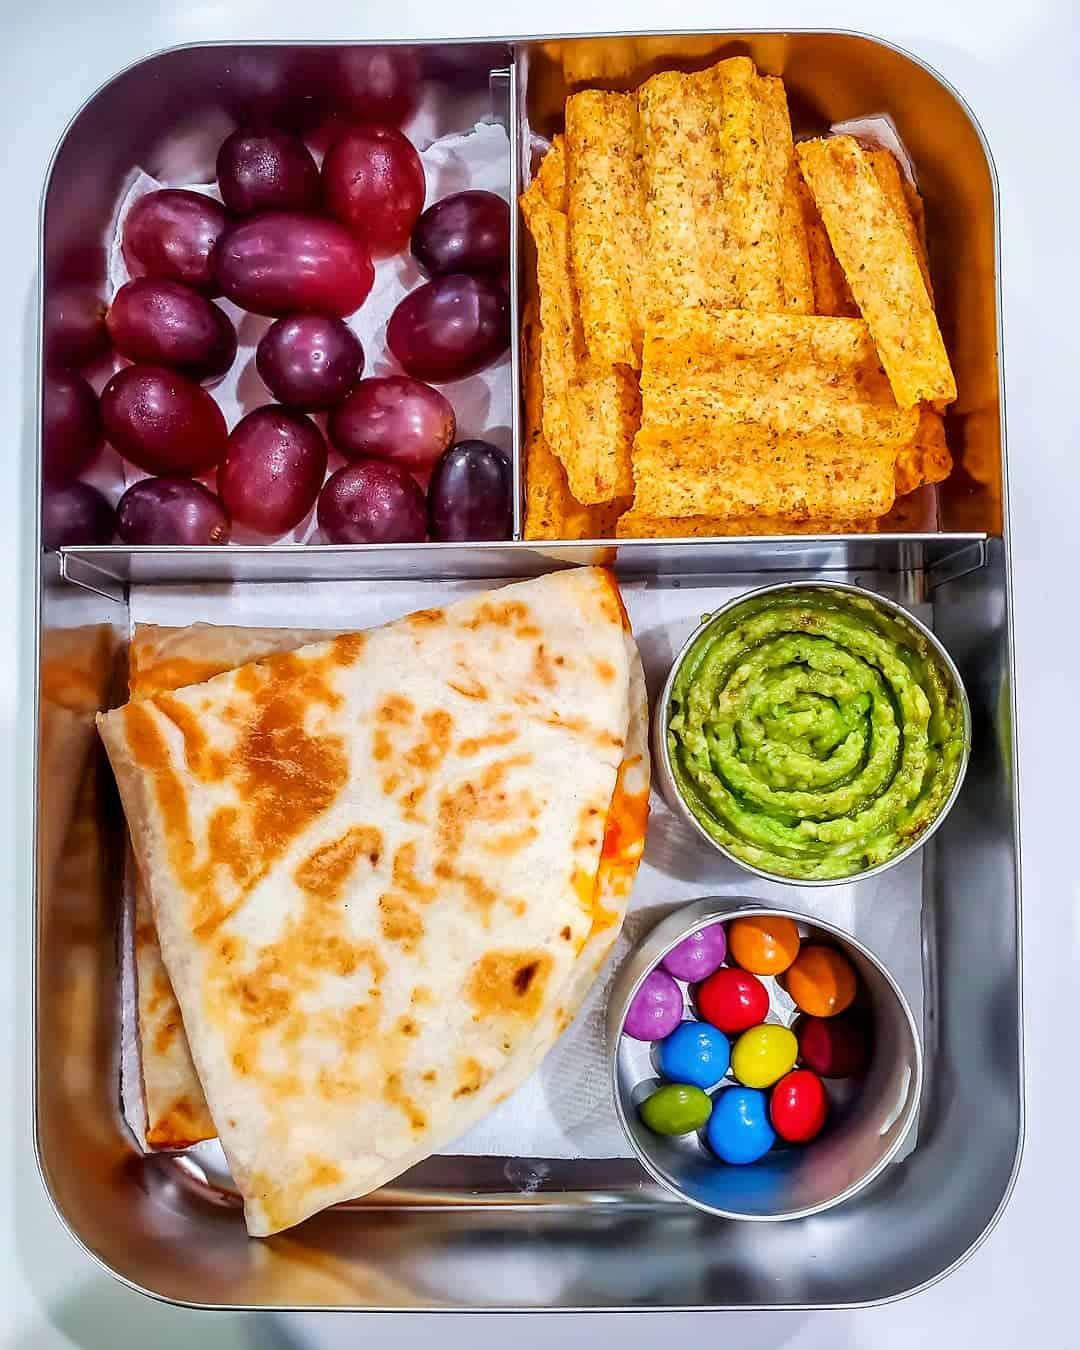 Quesadilla,Guacamole, chips, grapes and chocolate drops